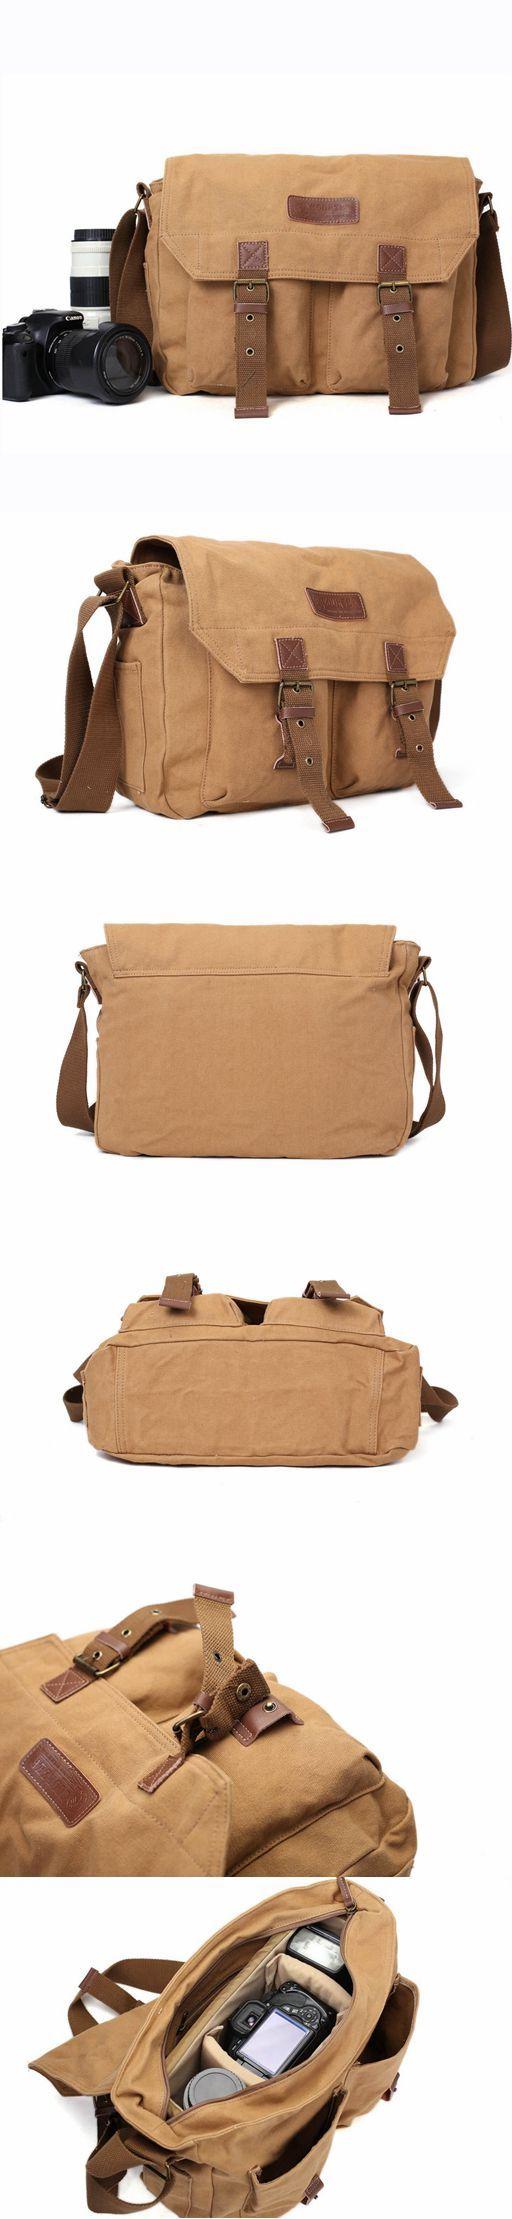 Khaki Canvas DSLR Camera Bag, Professional SLR Camera Purse Fit Canon Nikon F1003